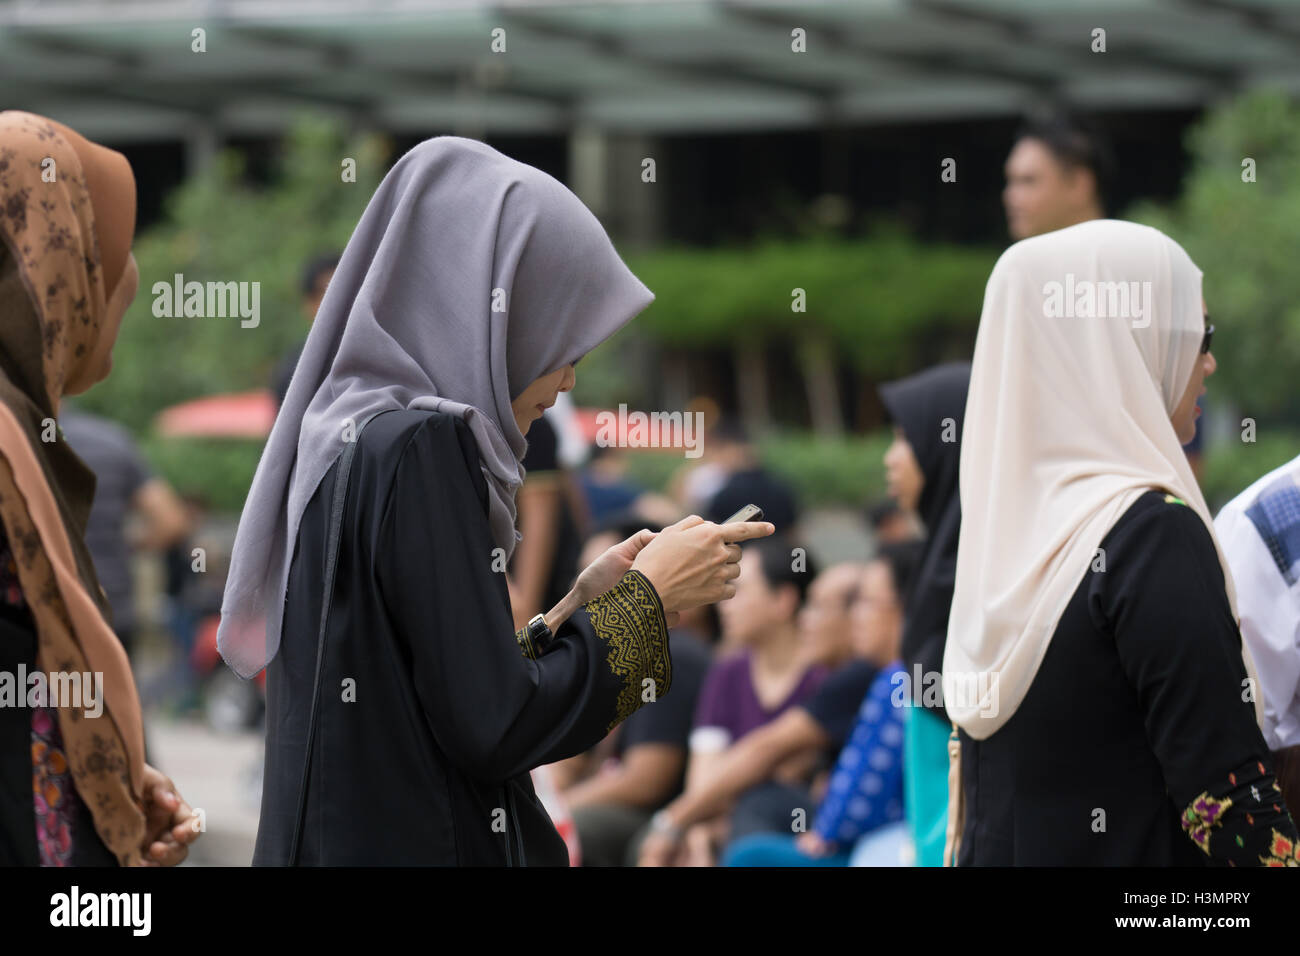 Muslim women wearing Hijab & using a mobile phone near to the Petronas Twin Towers,Kuala Lumpur,Malaysia - Stock Image